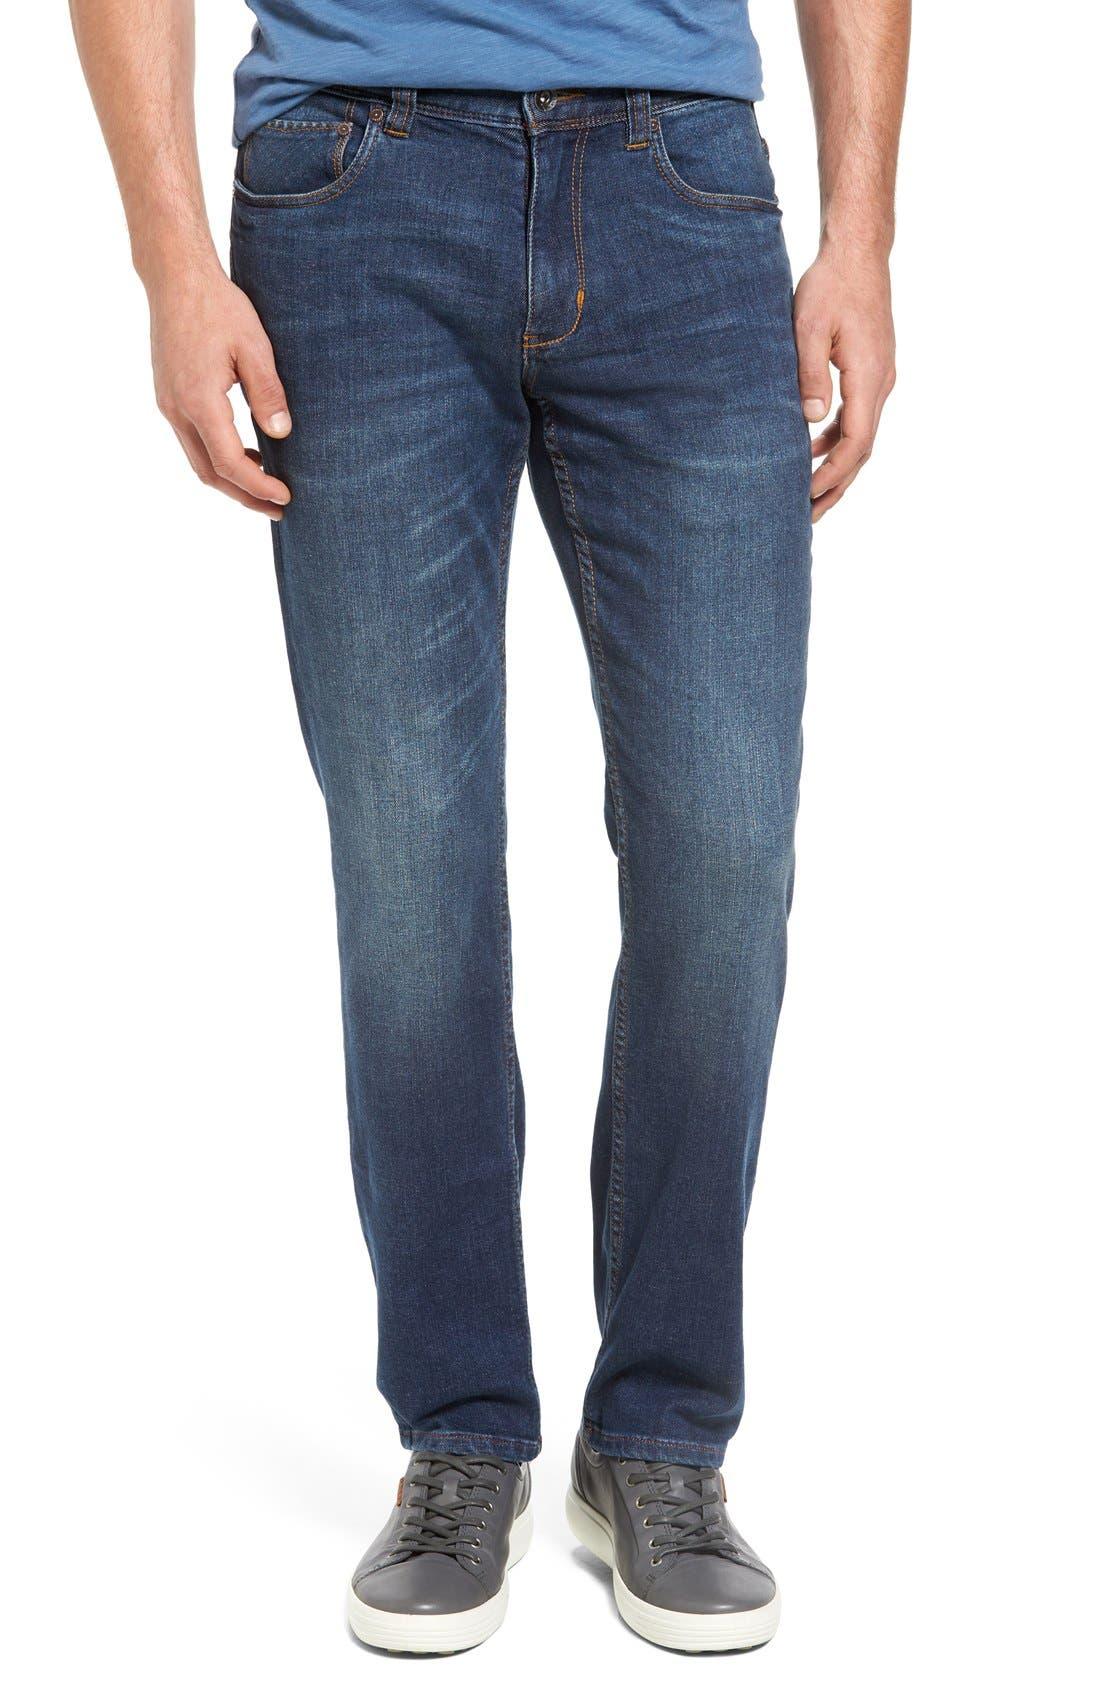 TOMMY BAHAMA Carmel Slim Fit Jeans